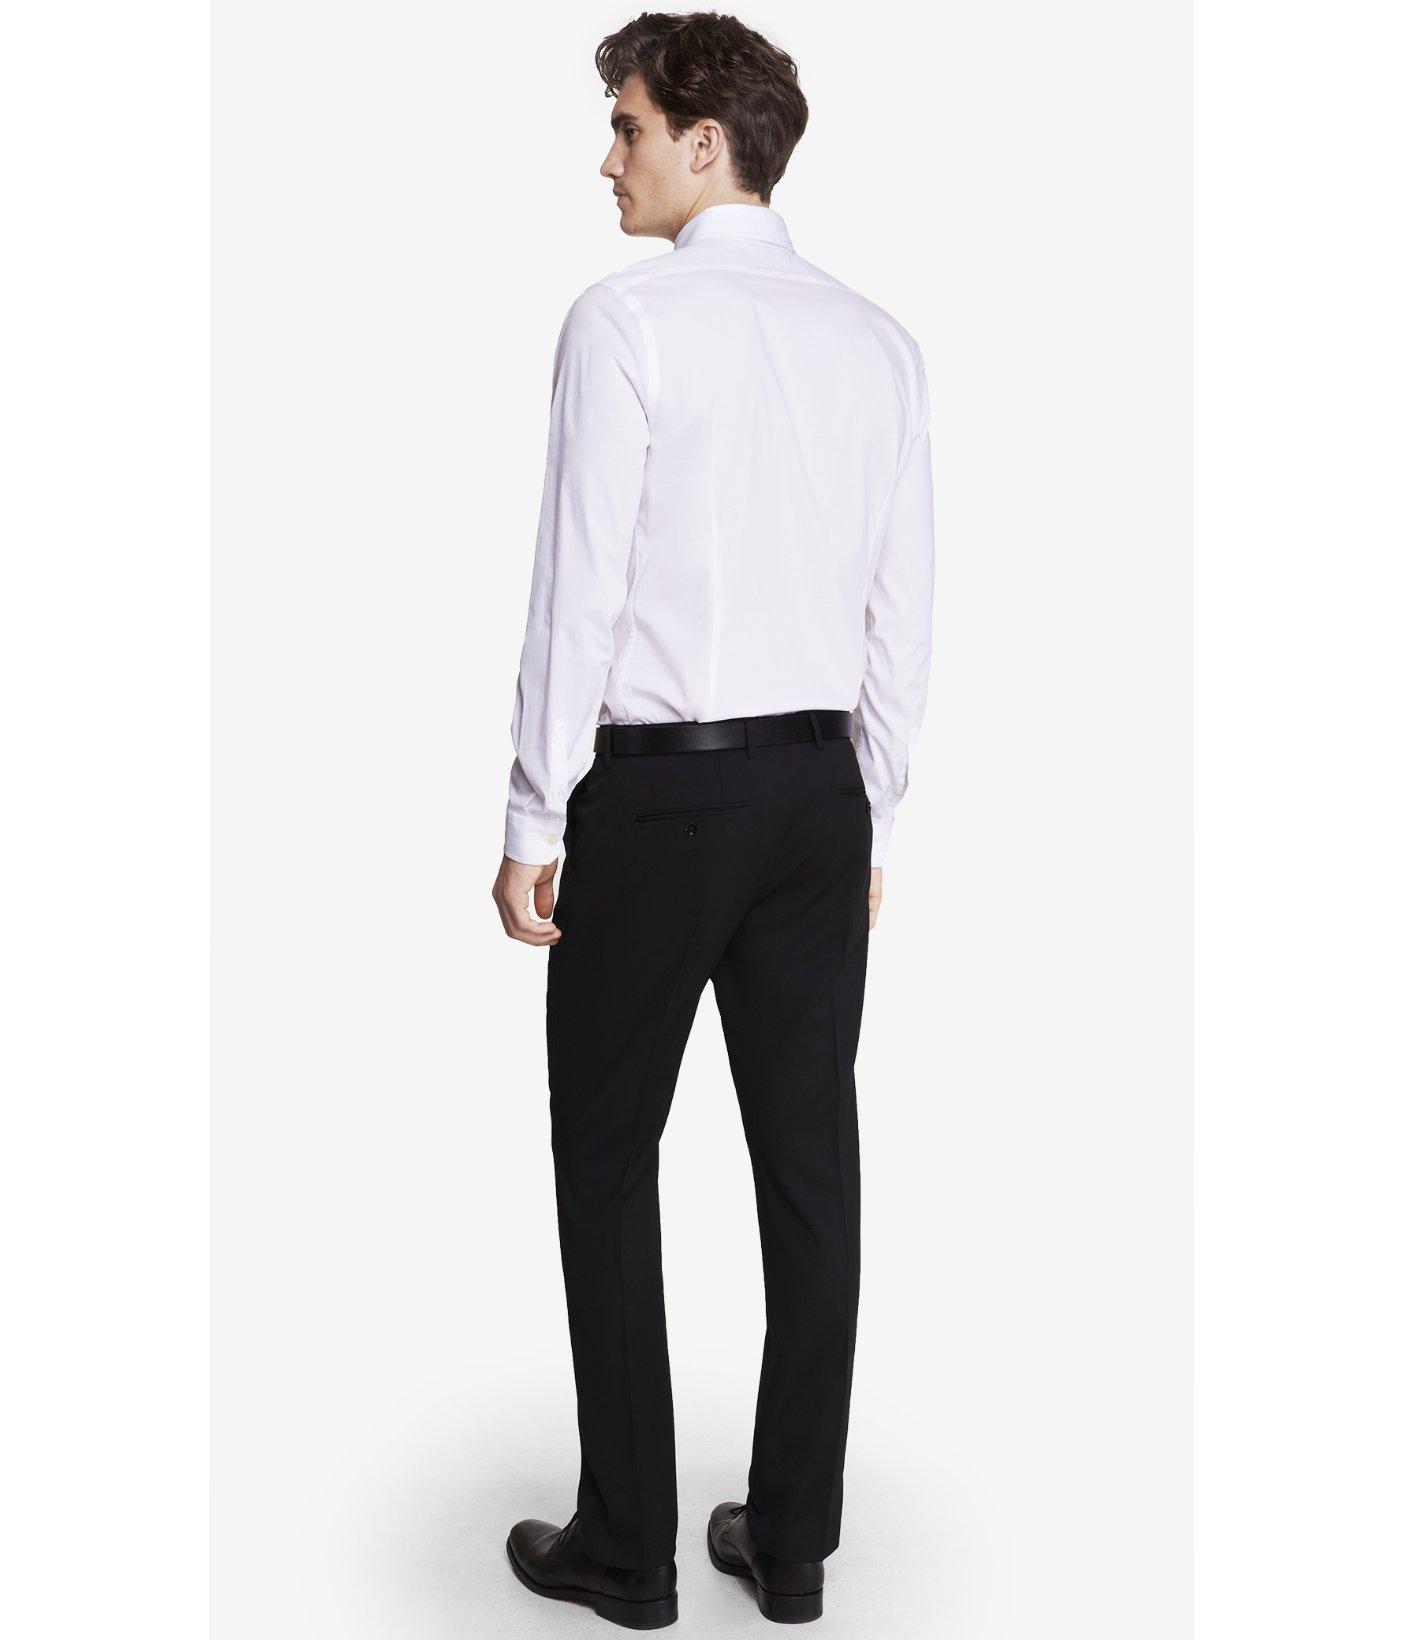 Express extra slim innovator black suit pant in black for for Extra slim tuxedo shirt